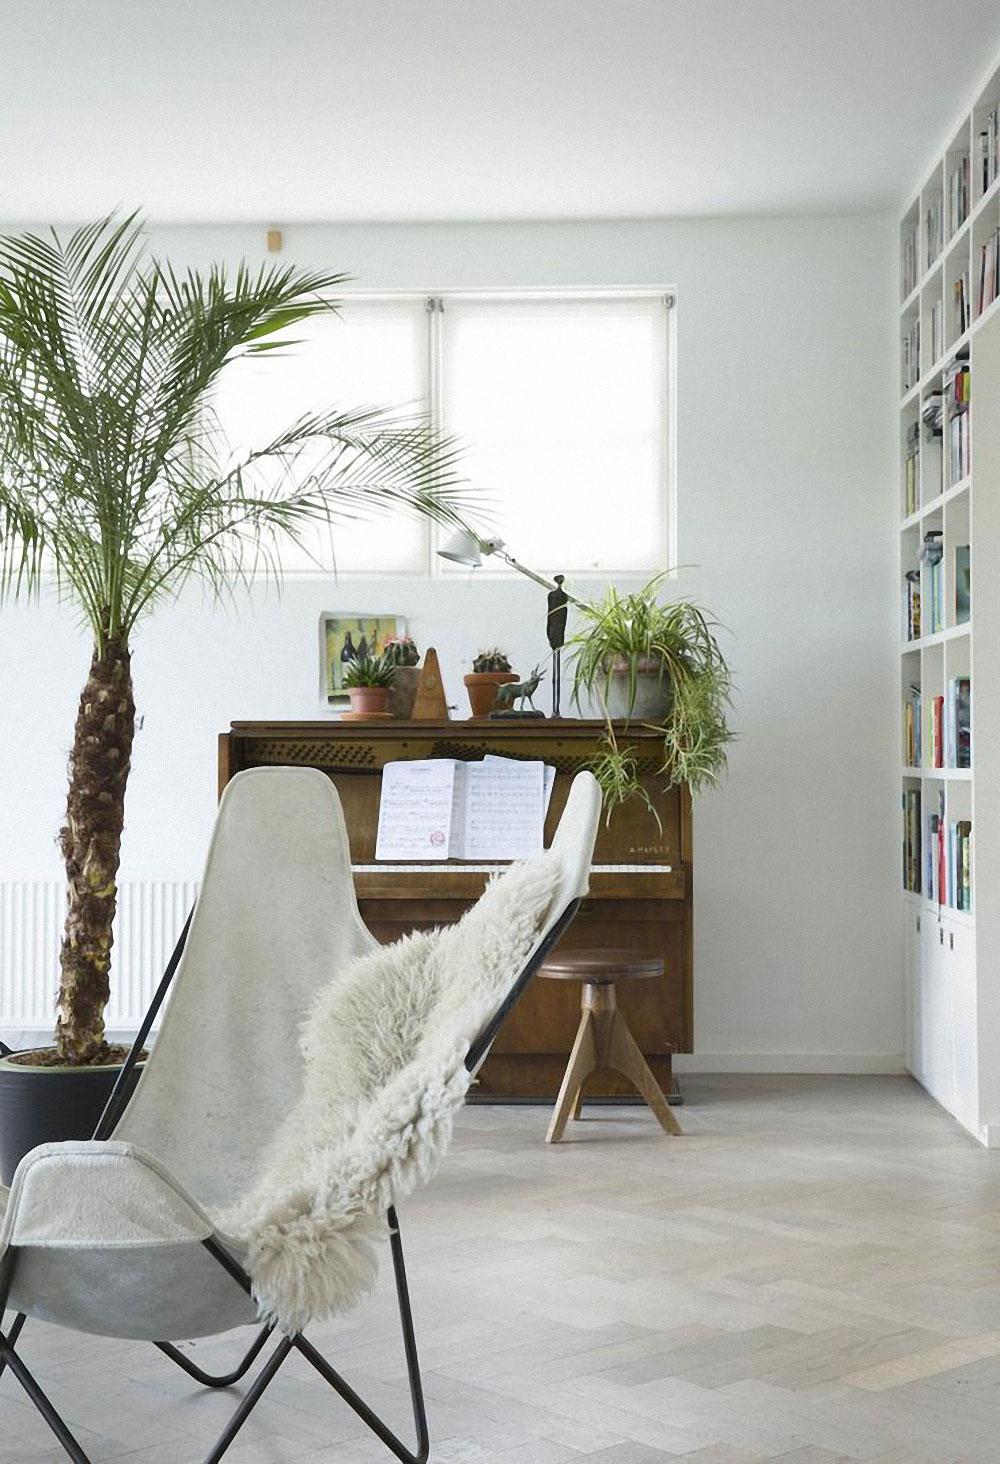 jestcafe.com-butterfly-chair5